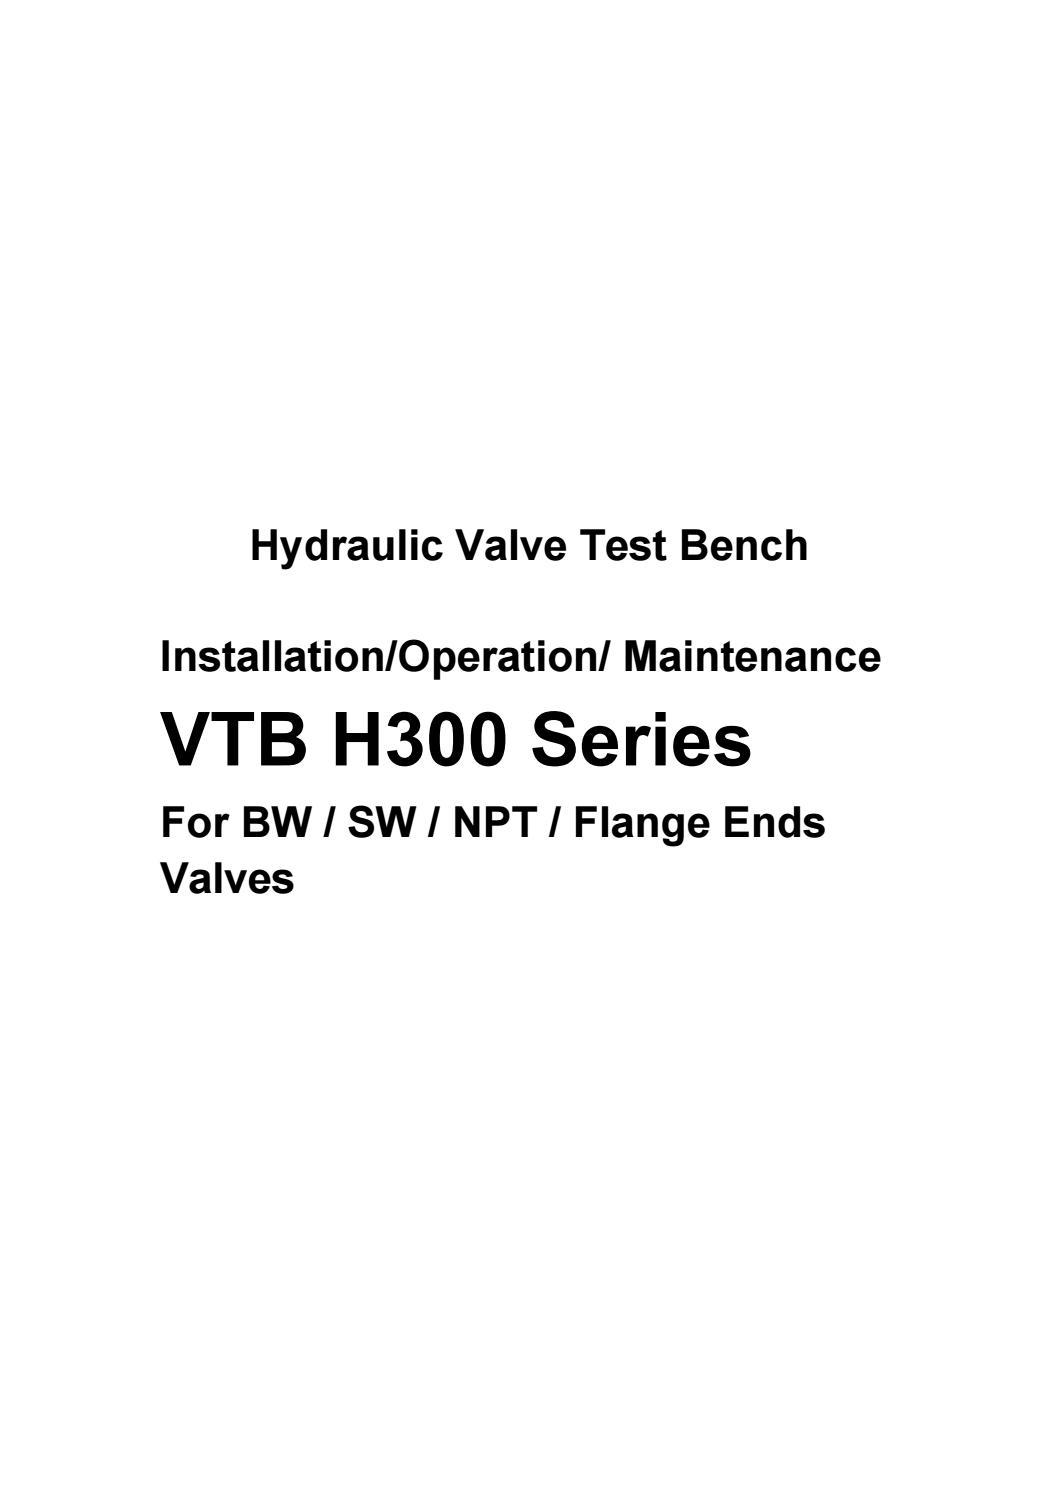 hydraulic valve test bench vtb h300 by valvetest issuu. Black Bedroom Furniture Sets. Home Design Ideas